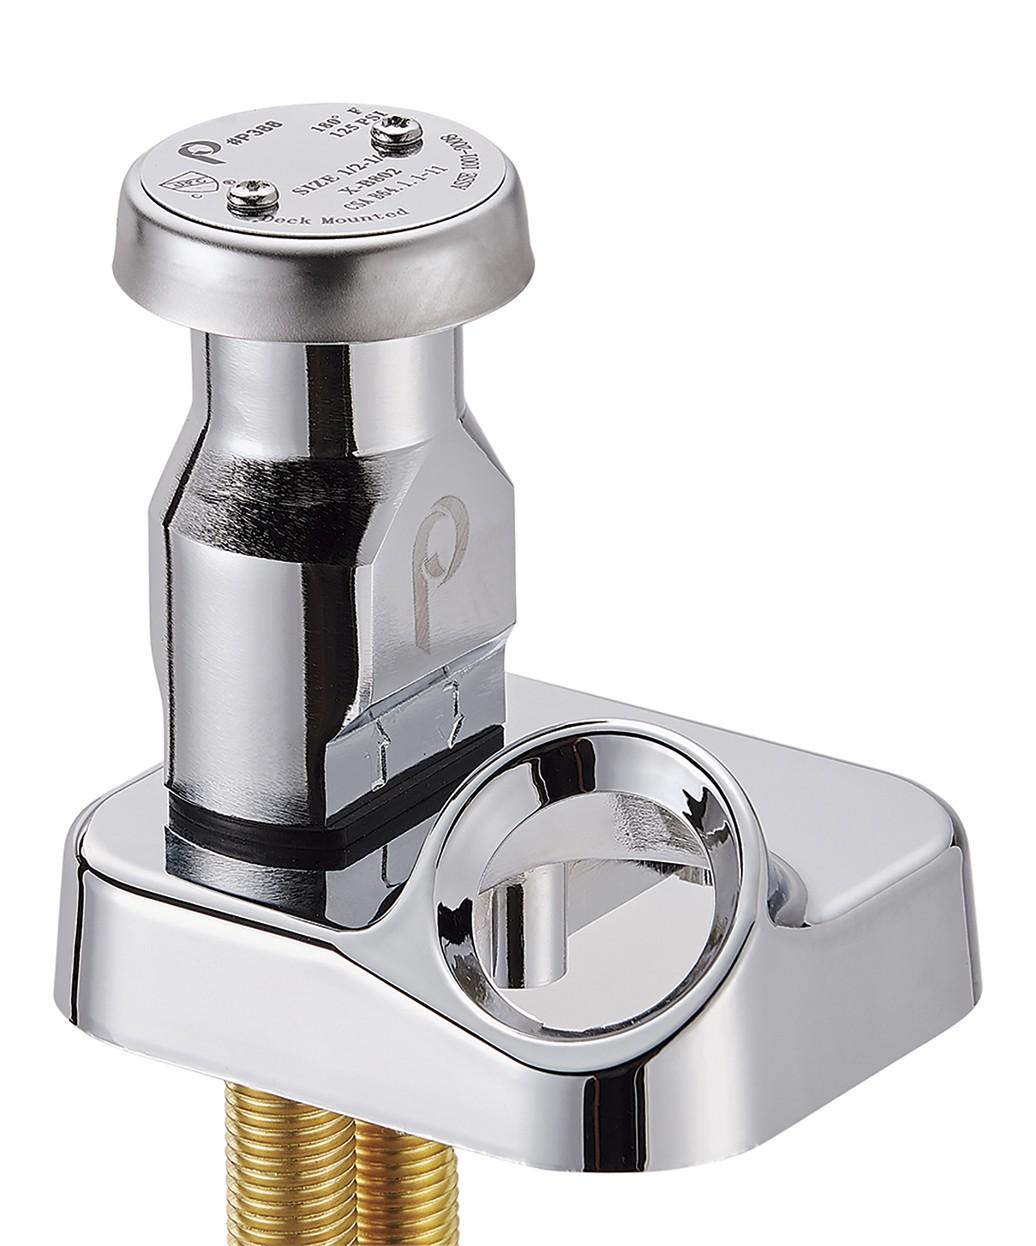 Pibbs P388C Vacuum Breaker Kit for Standard Shampoo Bowls